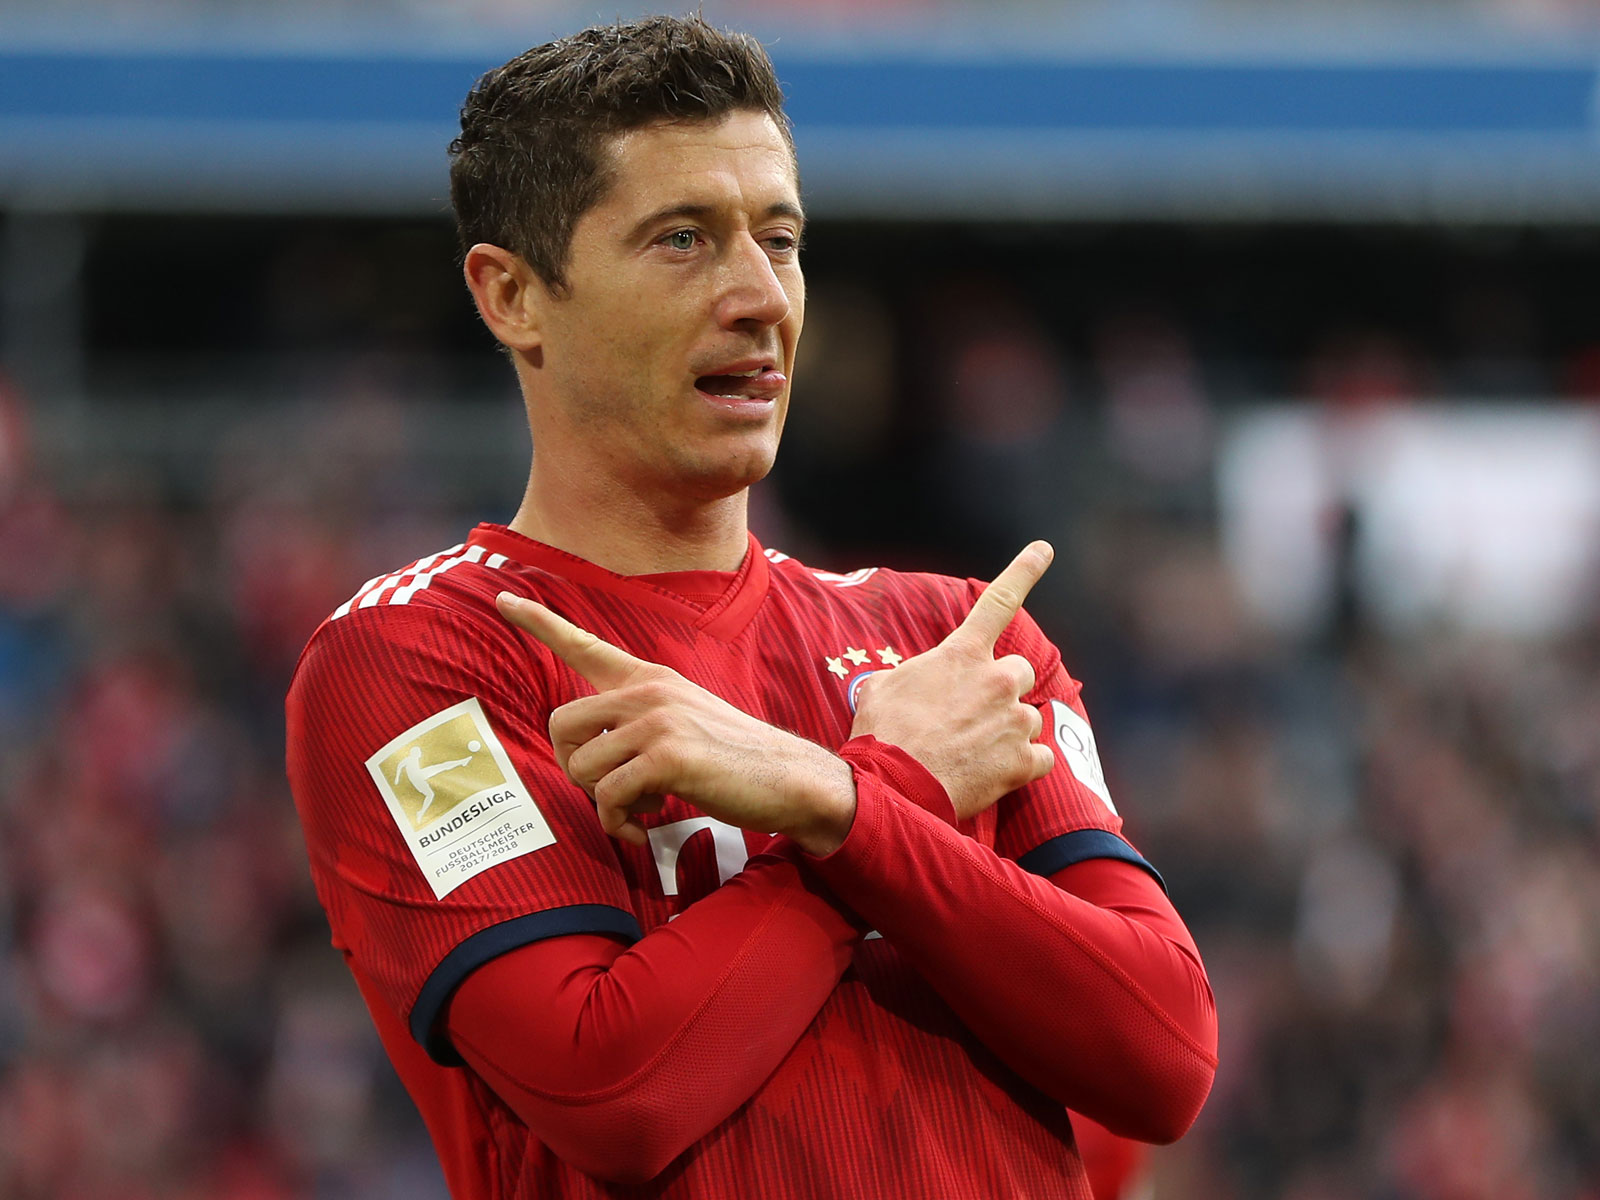 Robert Lewandowski leads Bayern Munich to another Bundesliga title